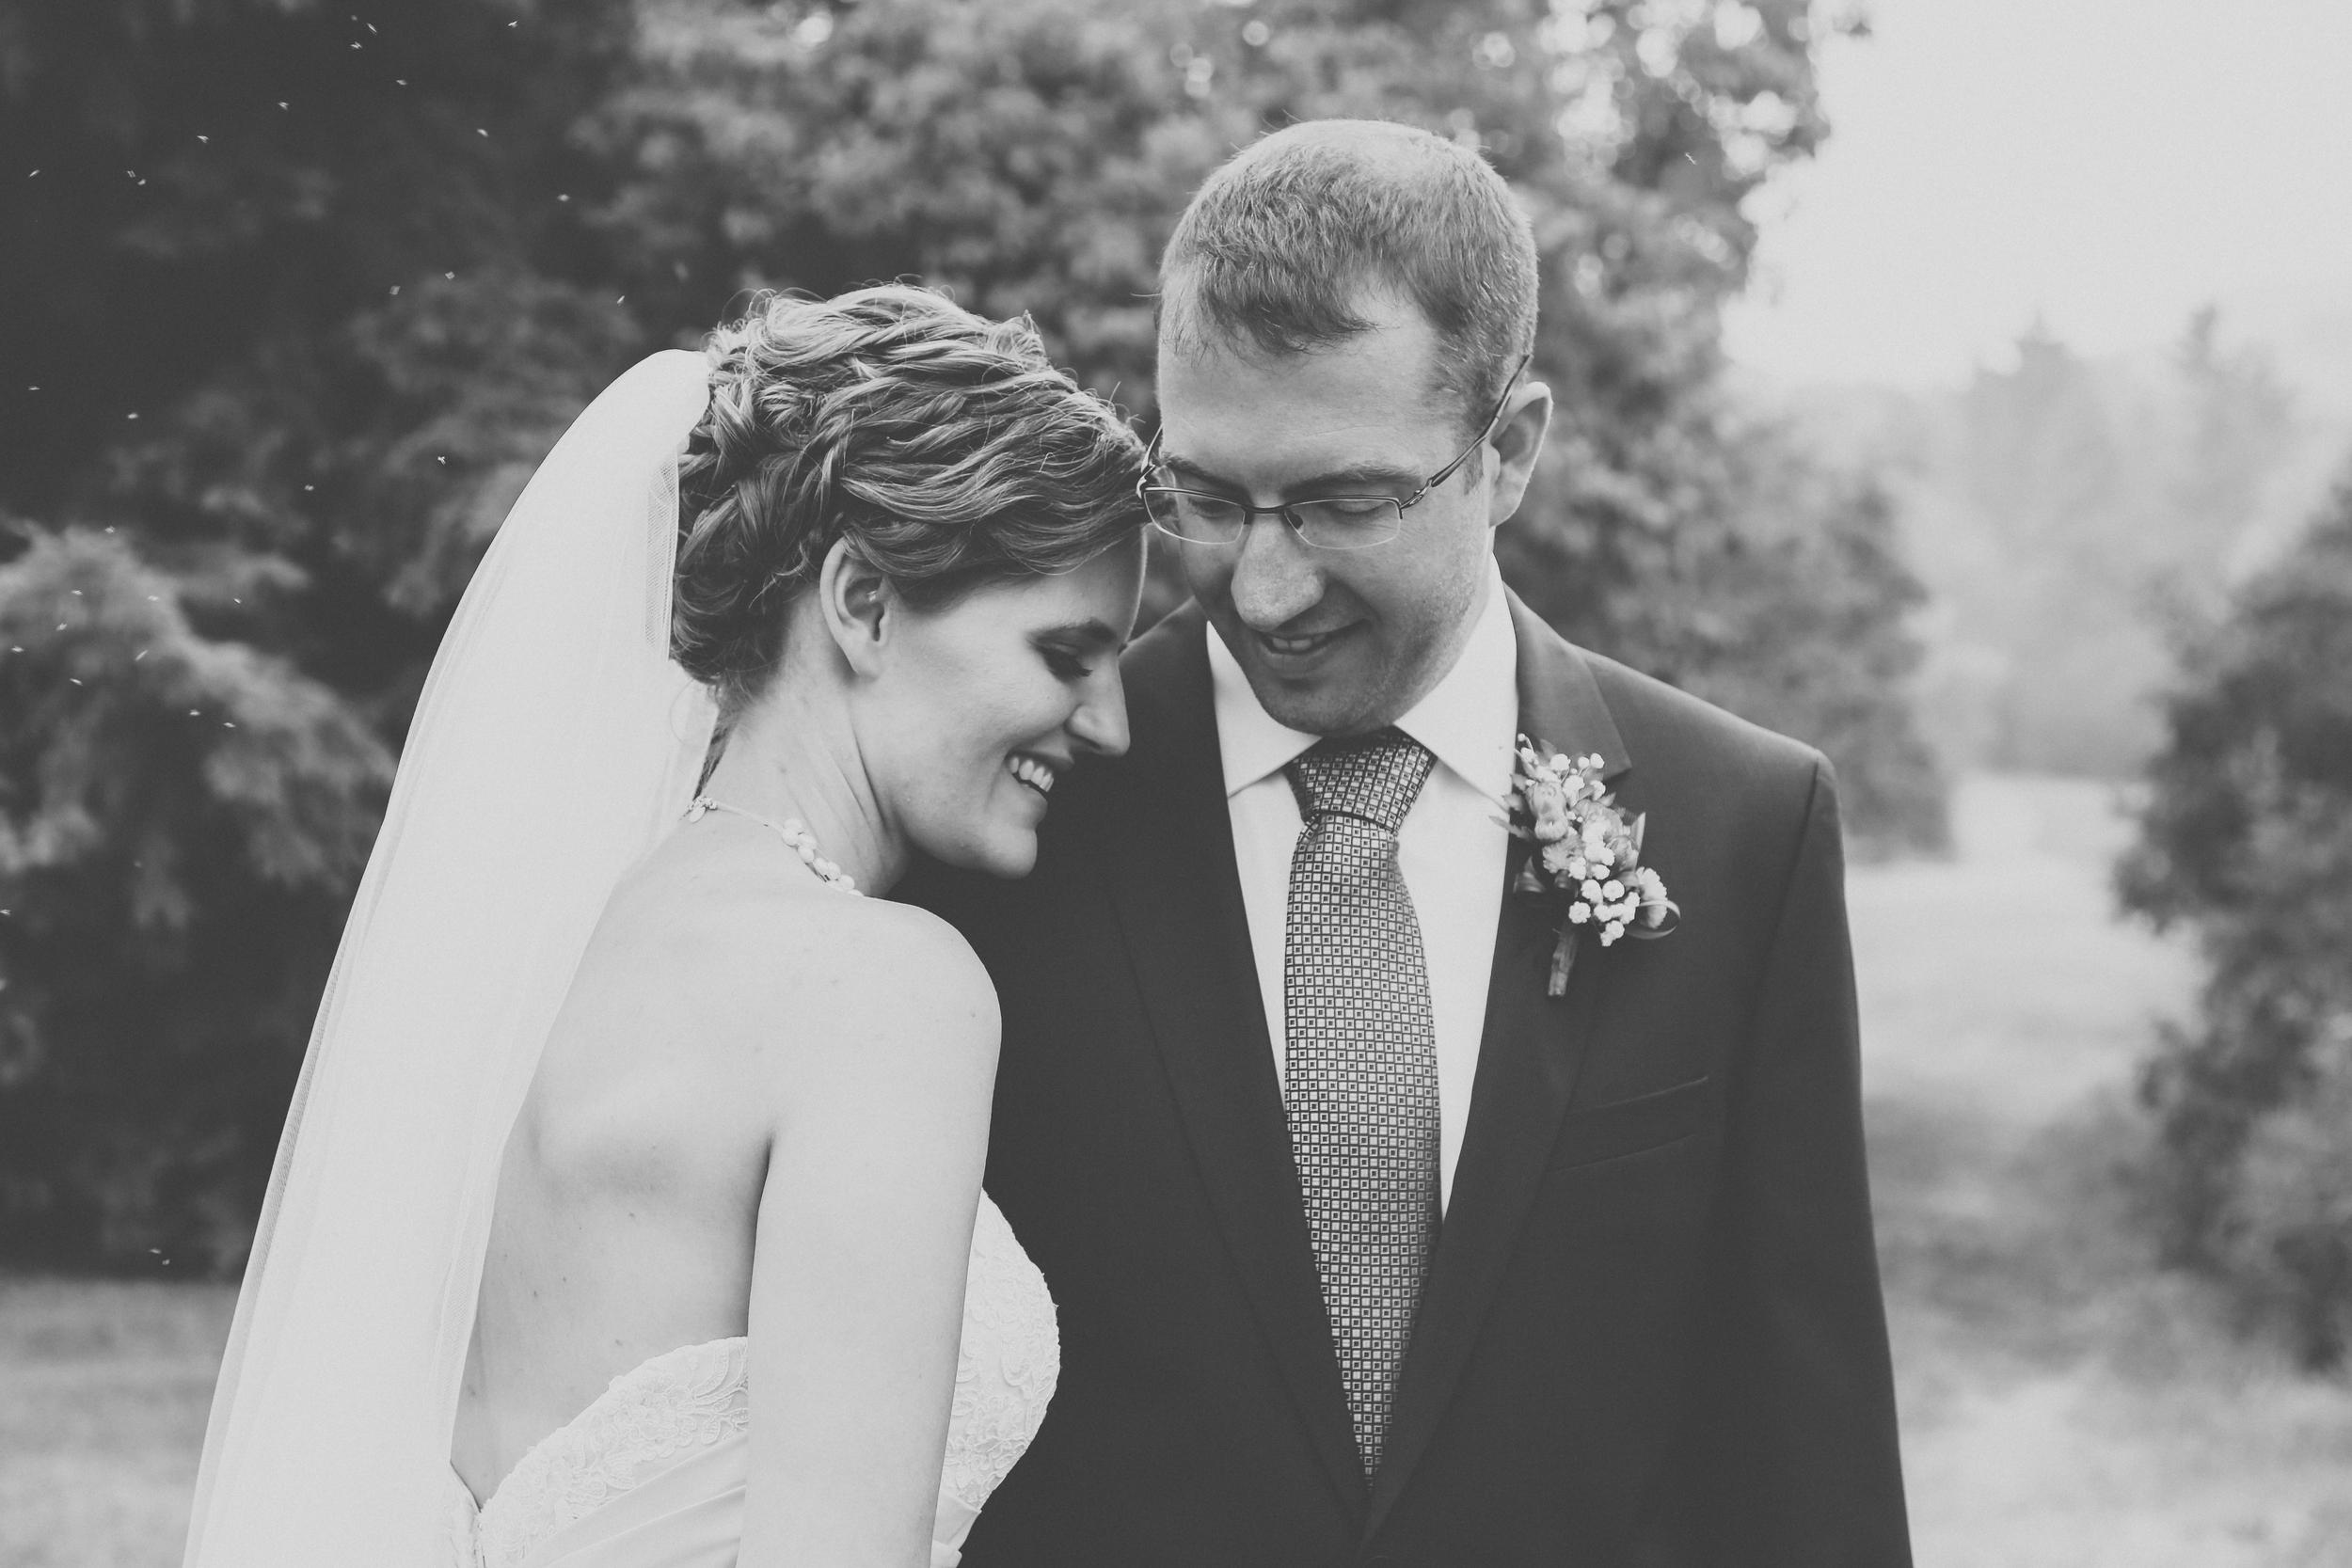 SharaiSiemens_Photography_Wedding_Three5.jpg